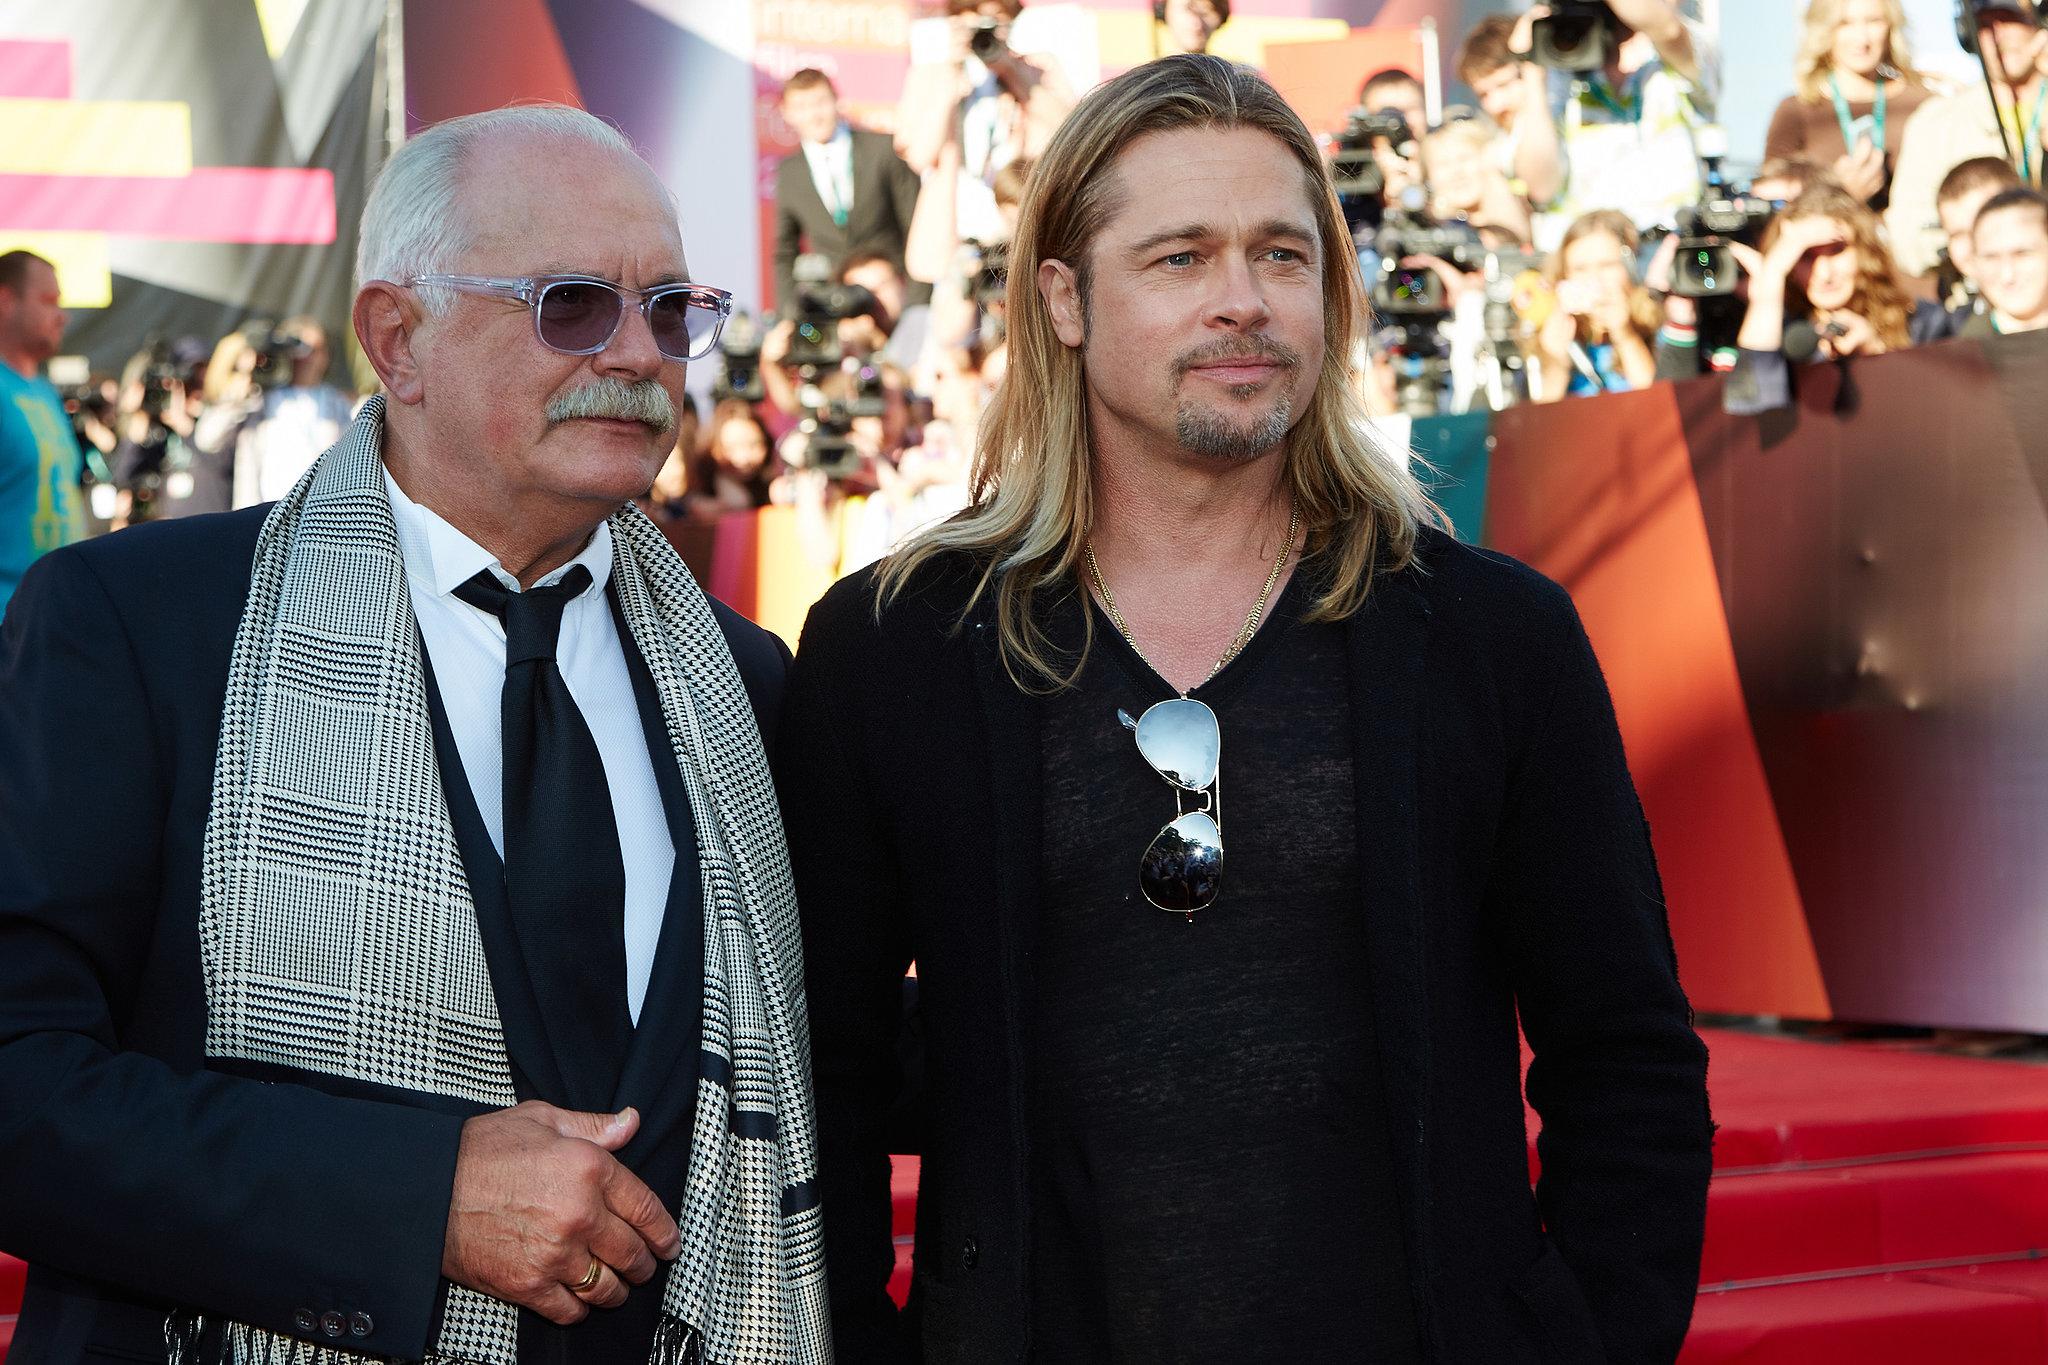 Brad Pitt posed with Nikita Mikhalkov.